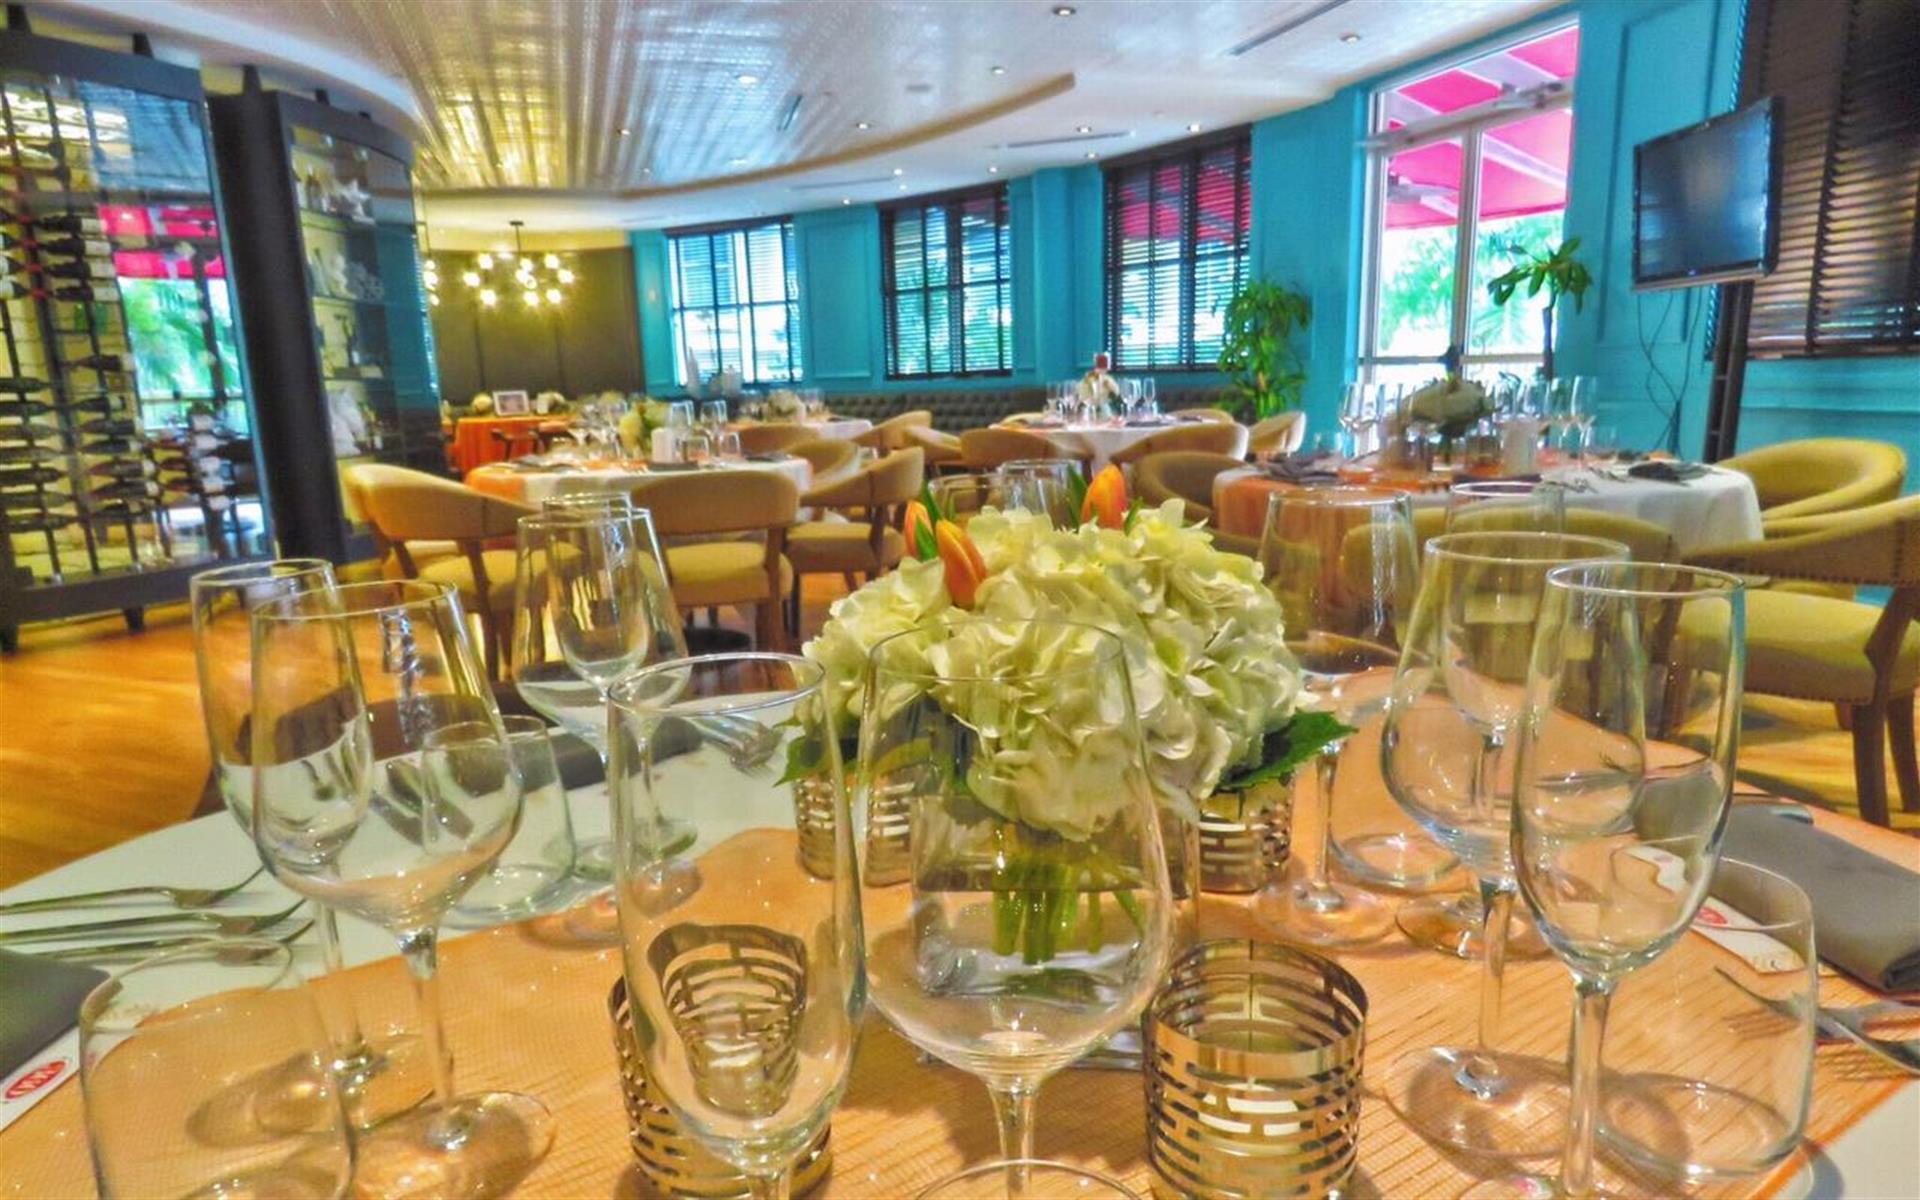 Melia Orlando Suite Hotel at Celebration - 180 Event Venue